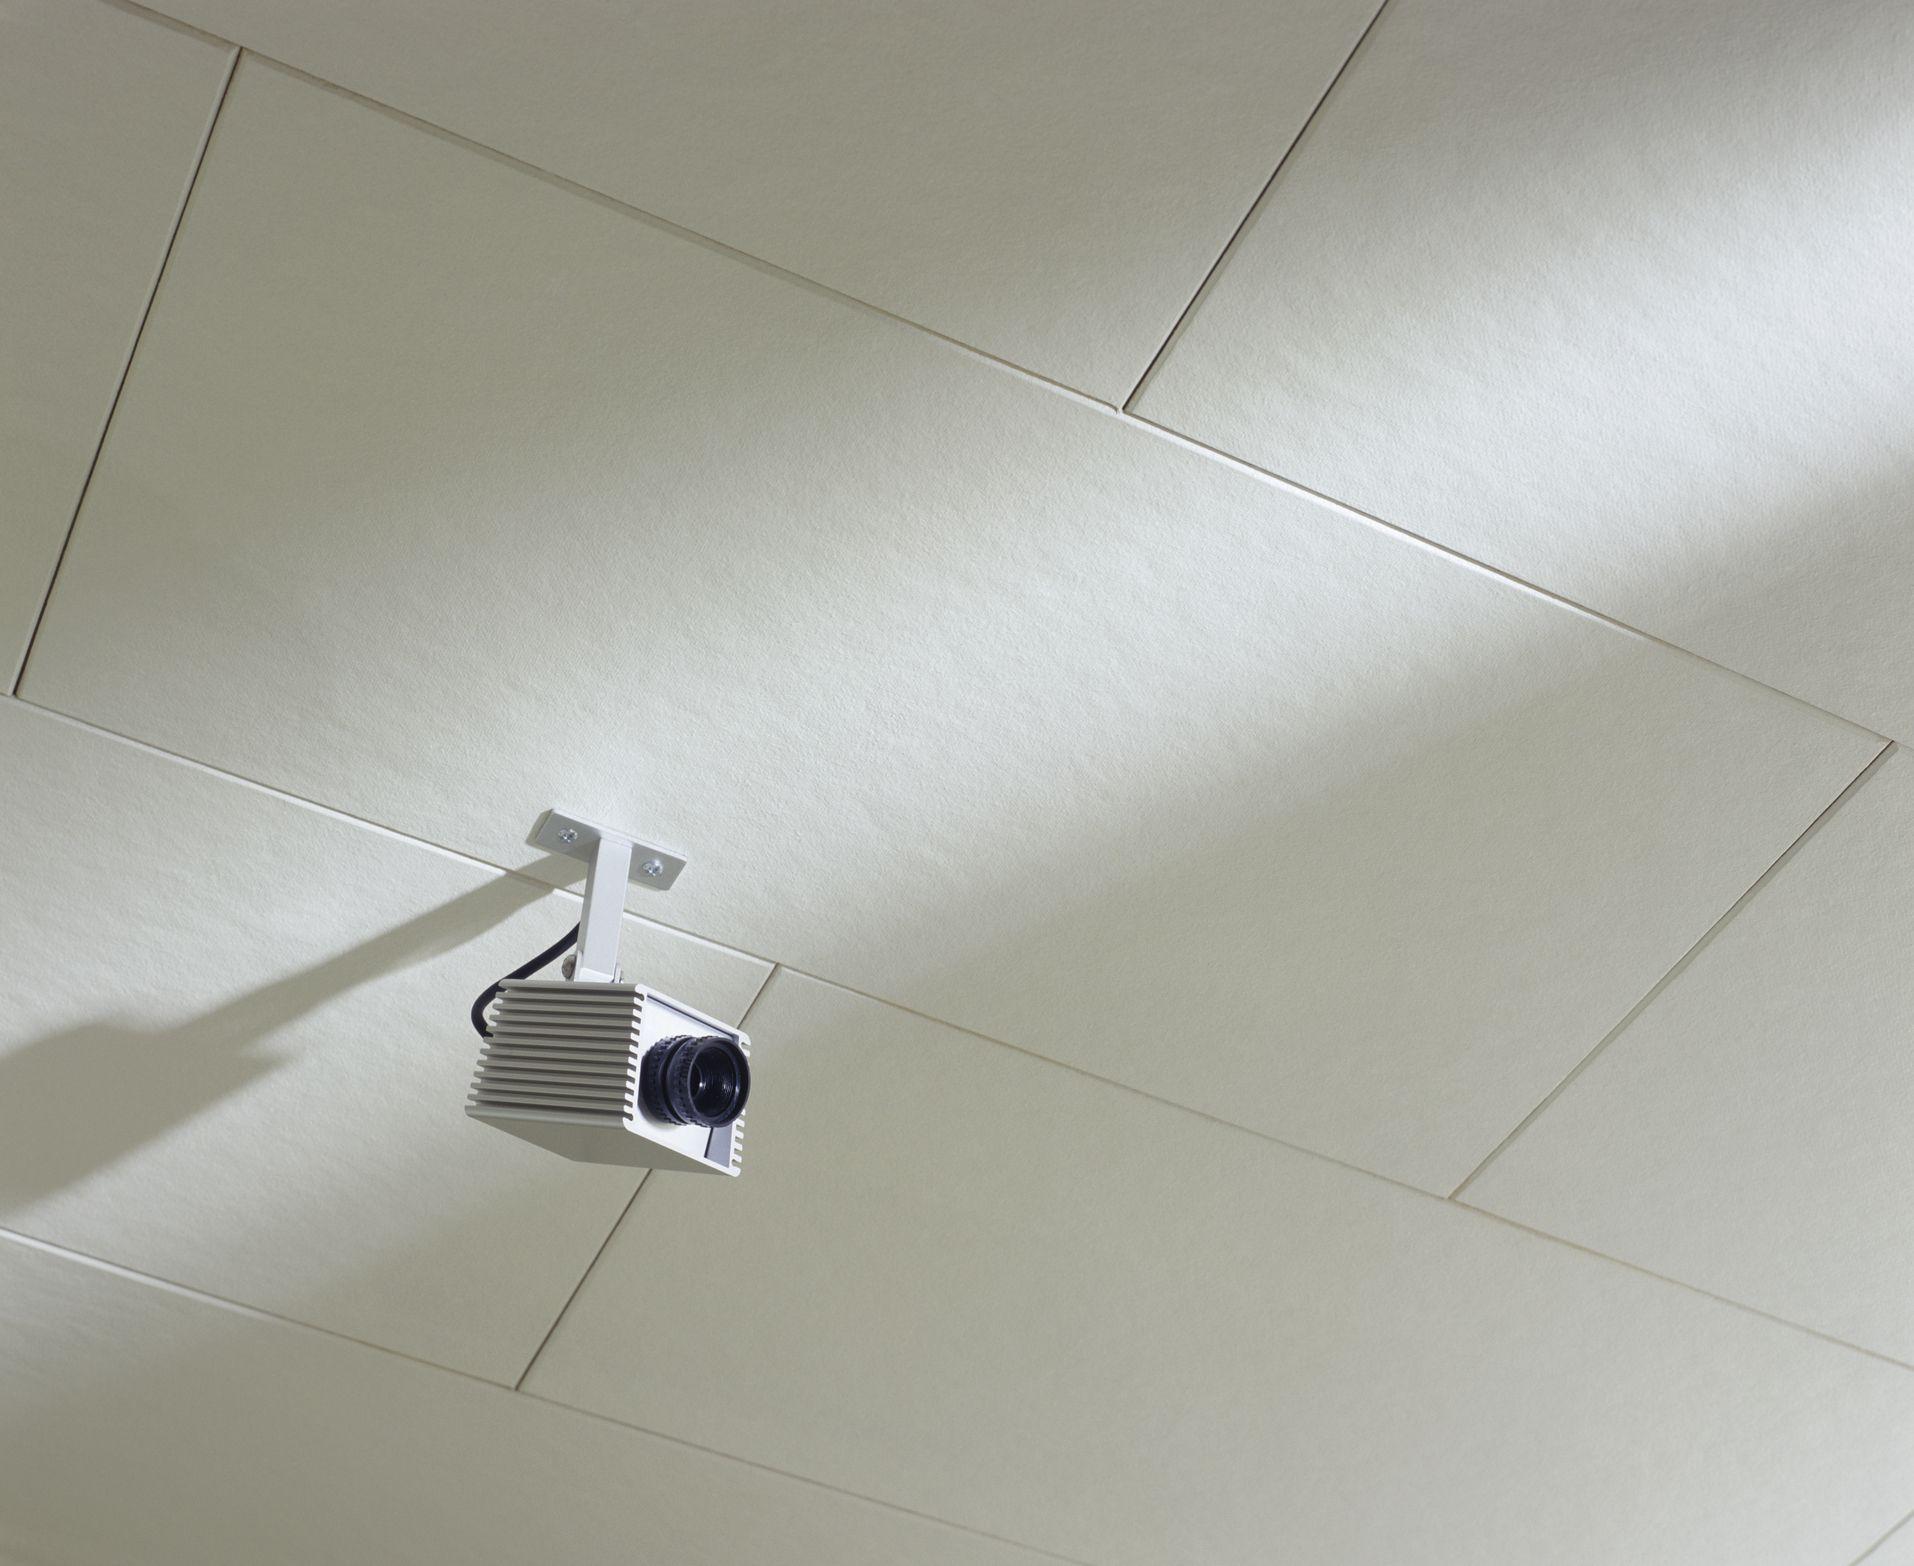 Free cam watch